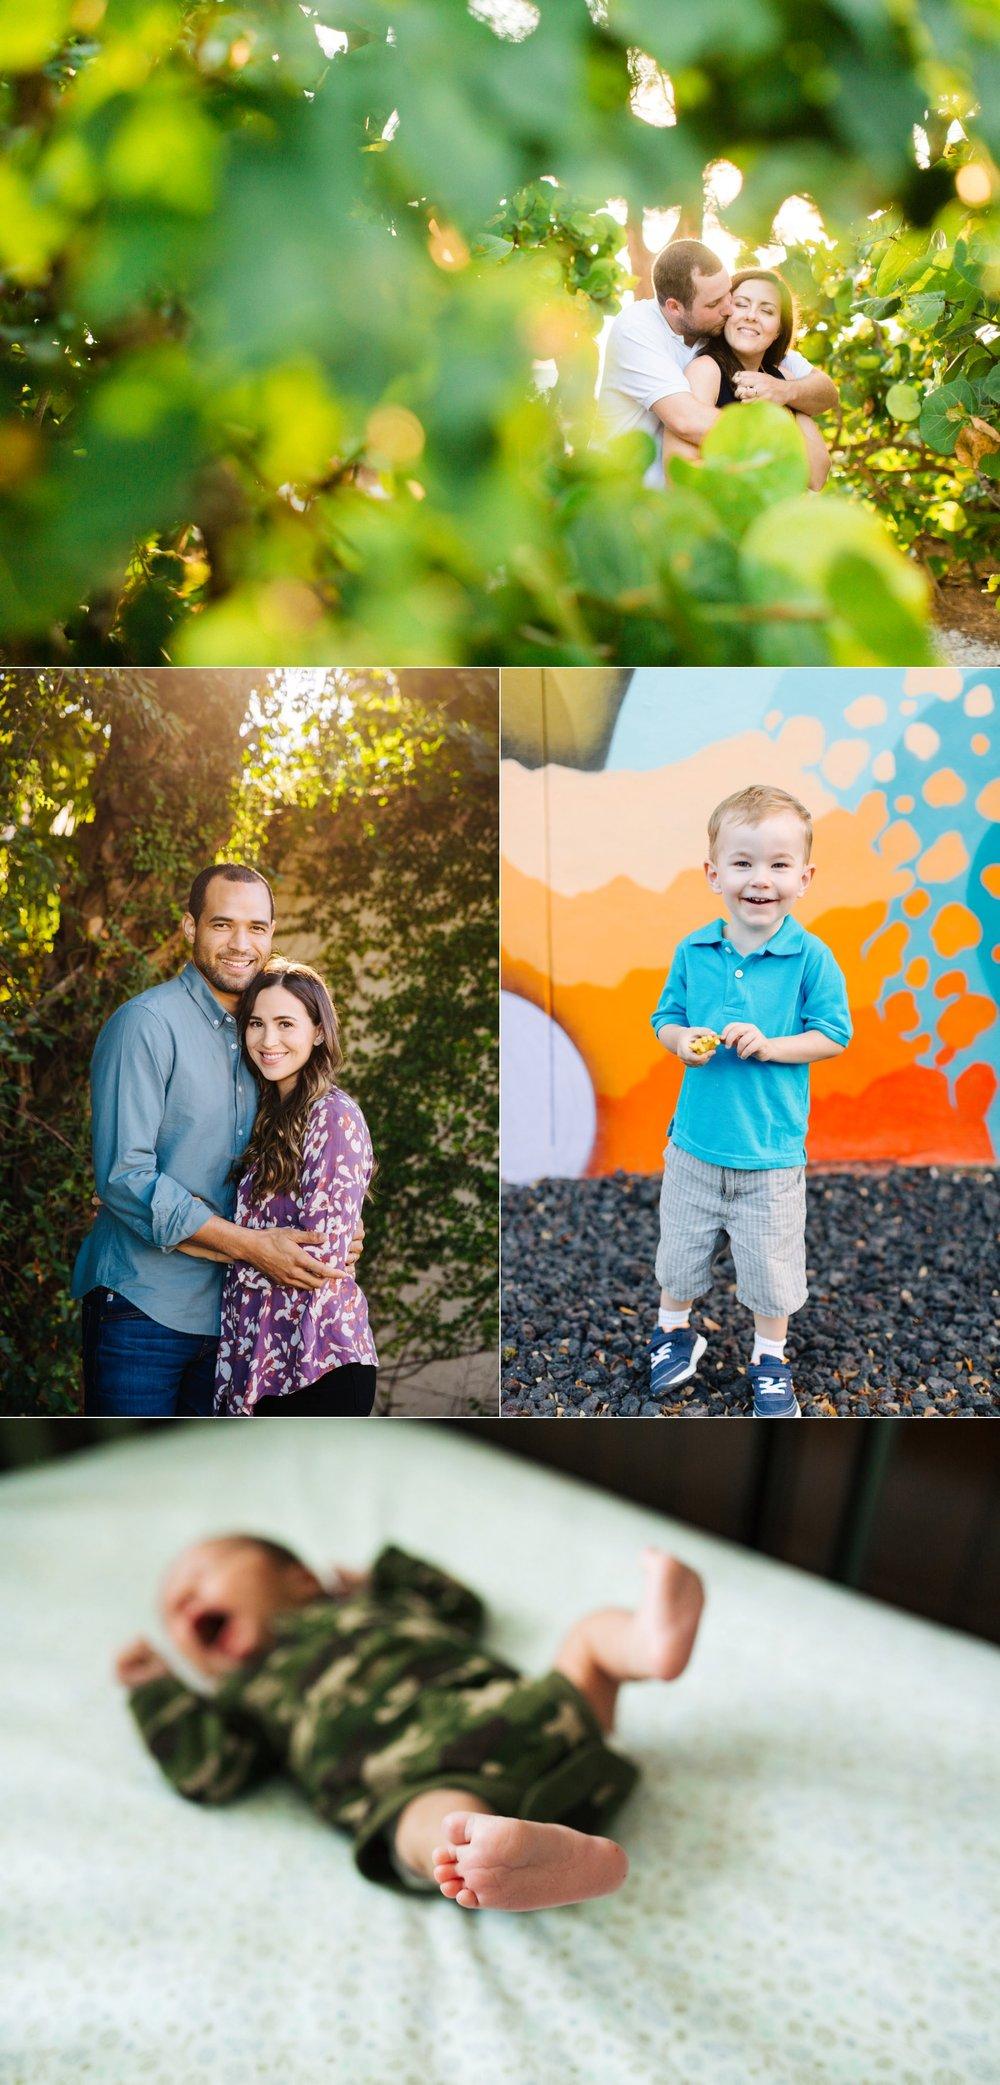 Jake & Katie's Best of Families 2016-021.jpg